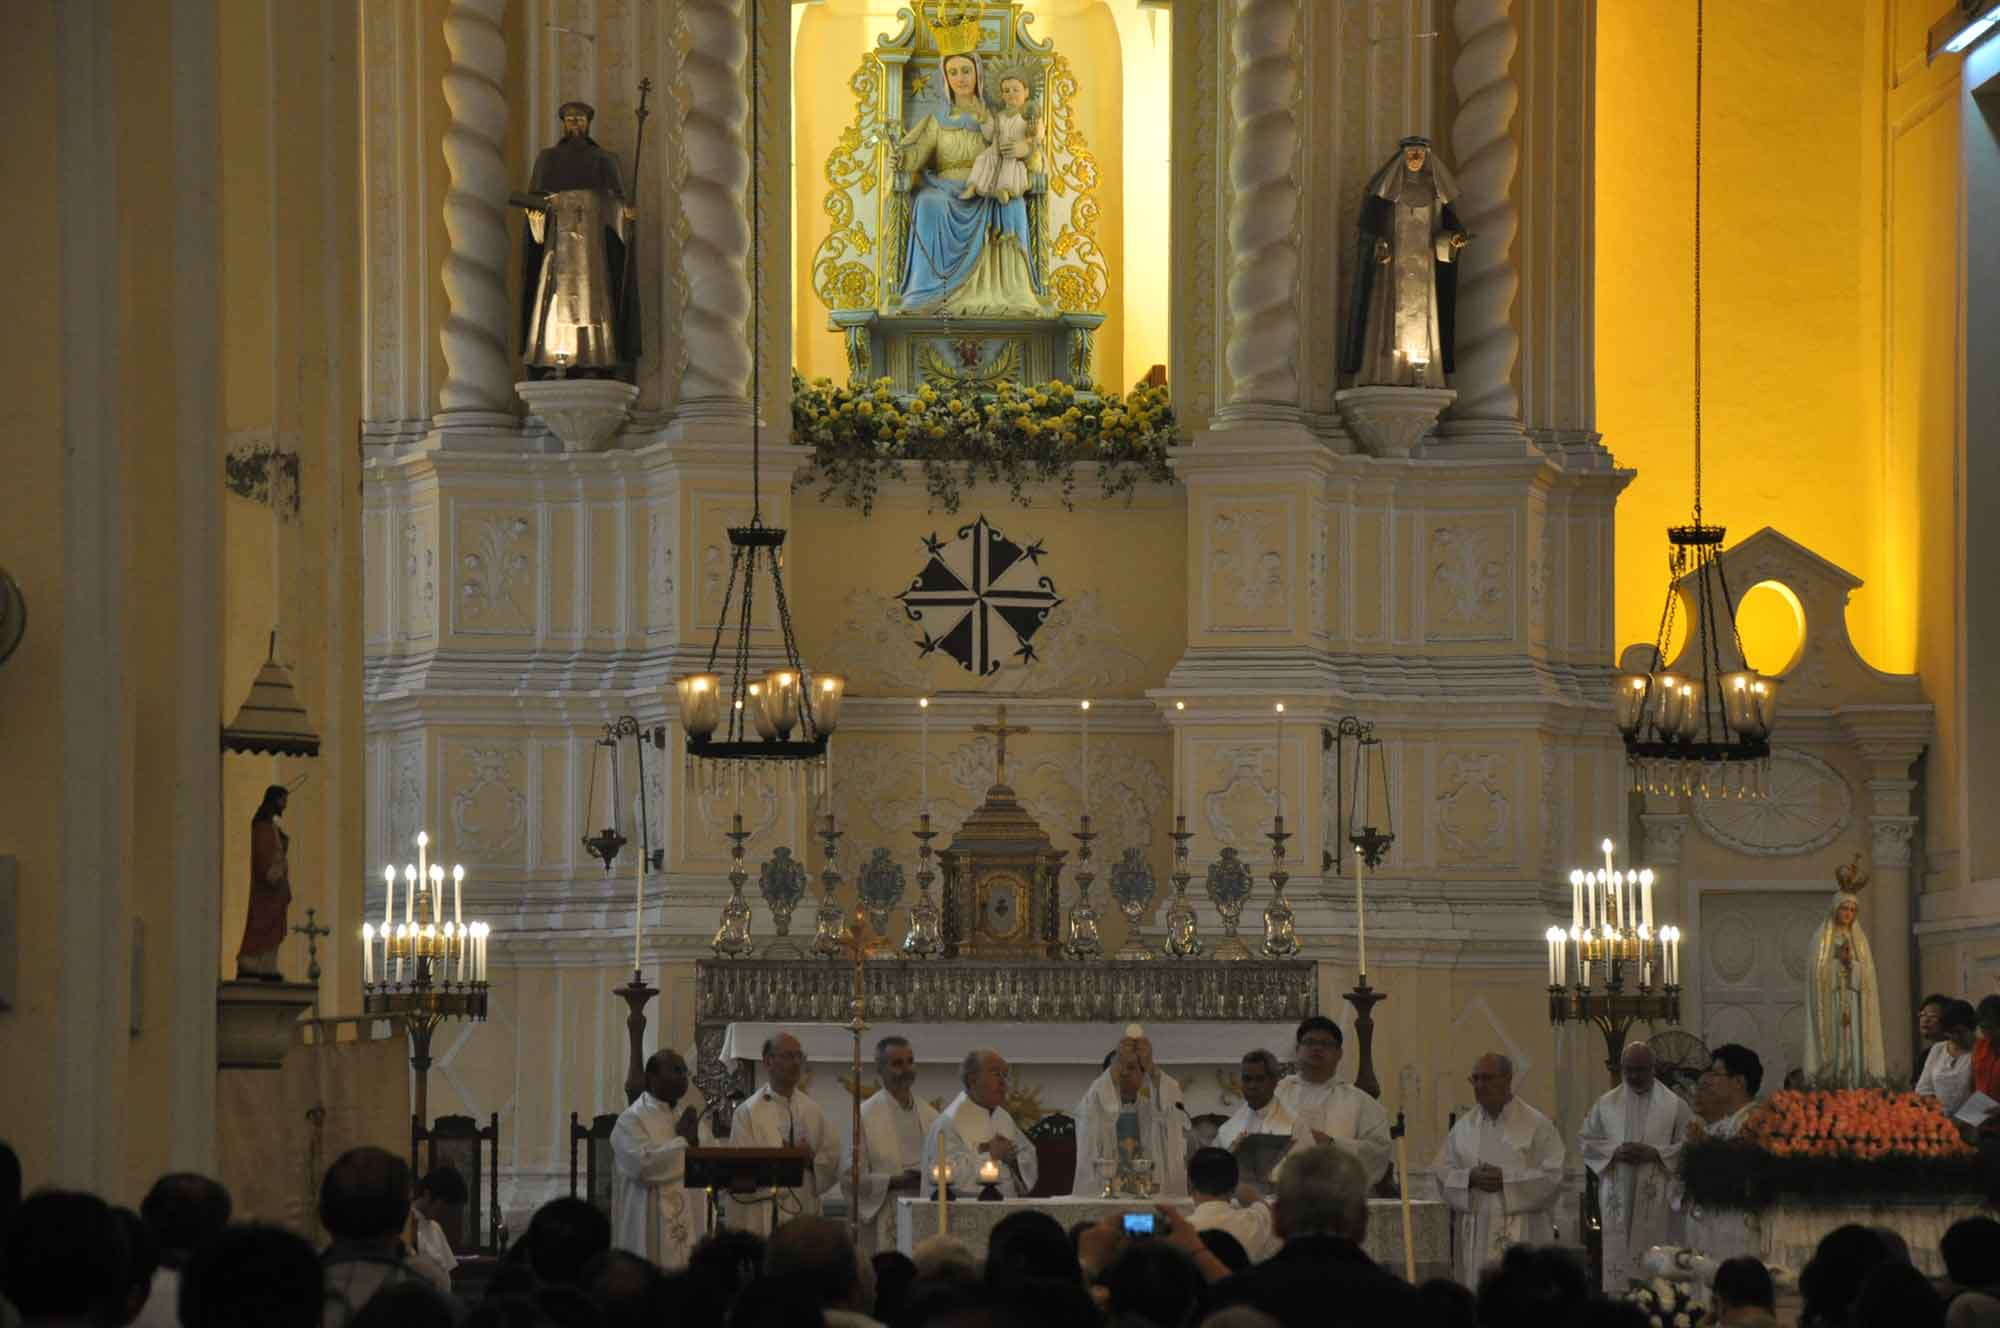 Macau's Our Lady of Fatima Procession St Dominics Church service